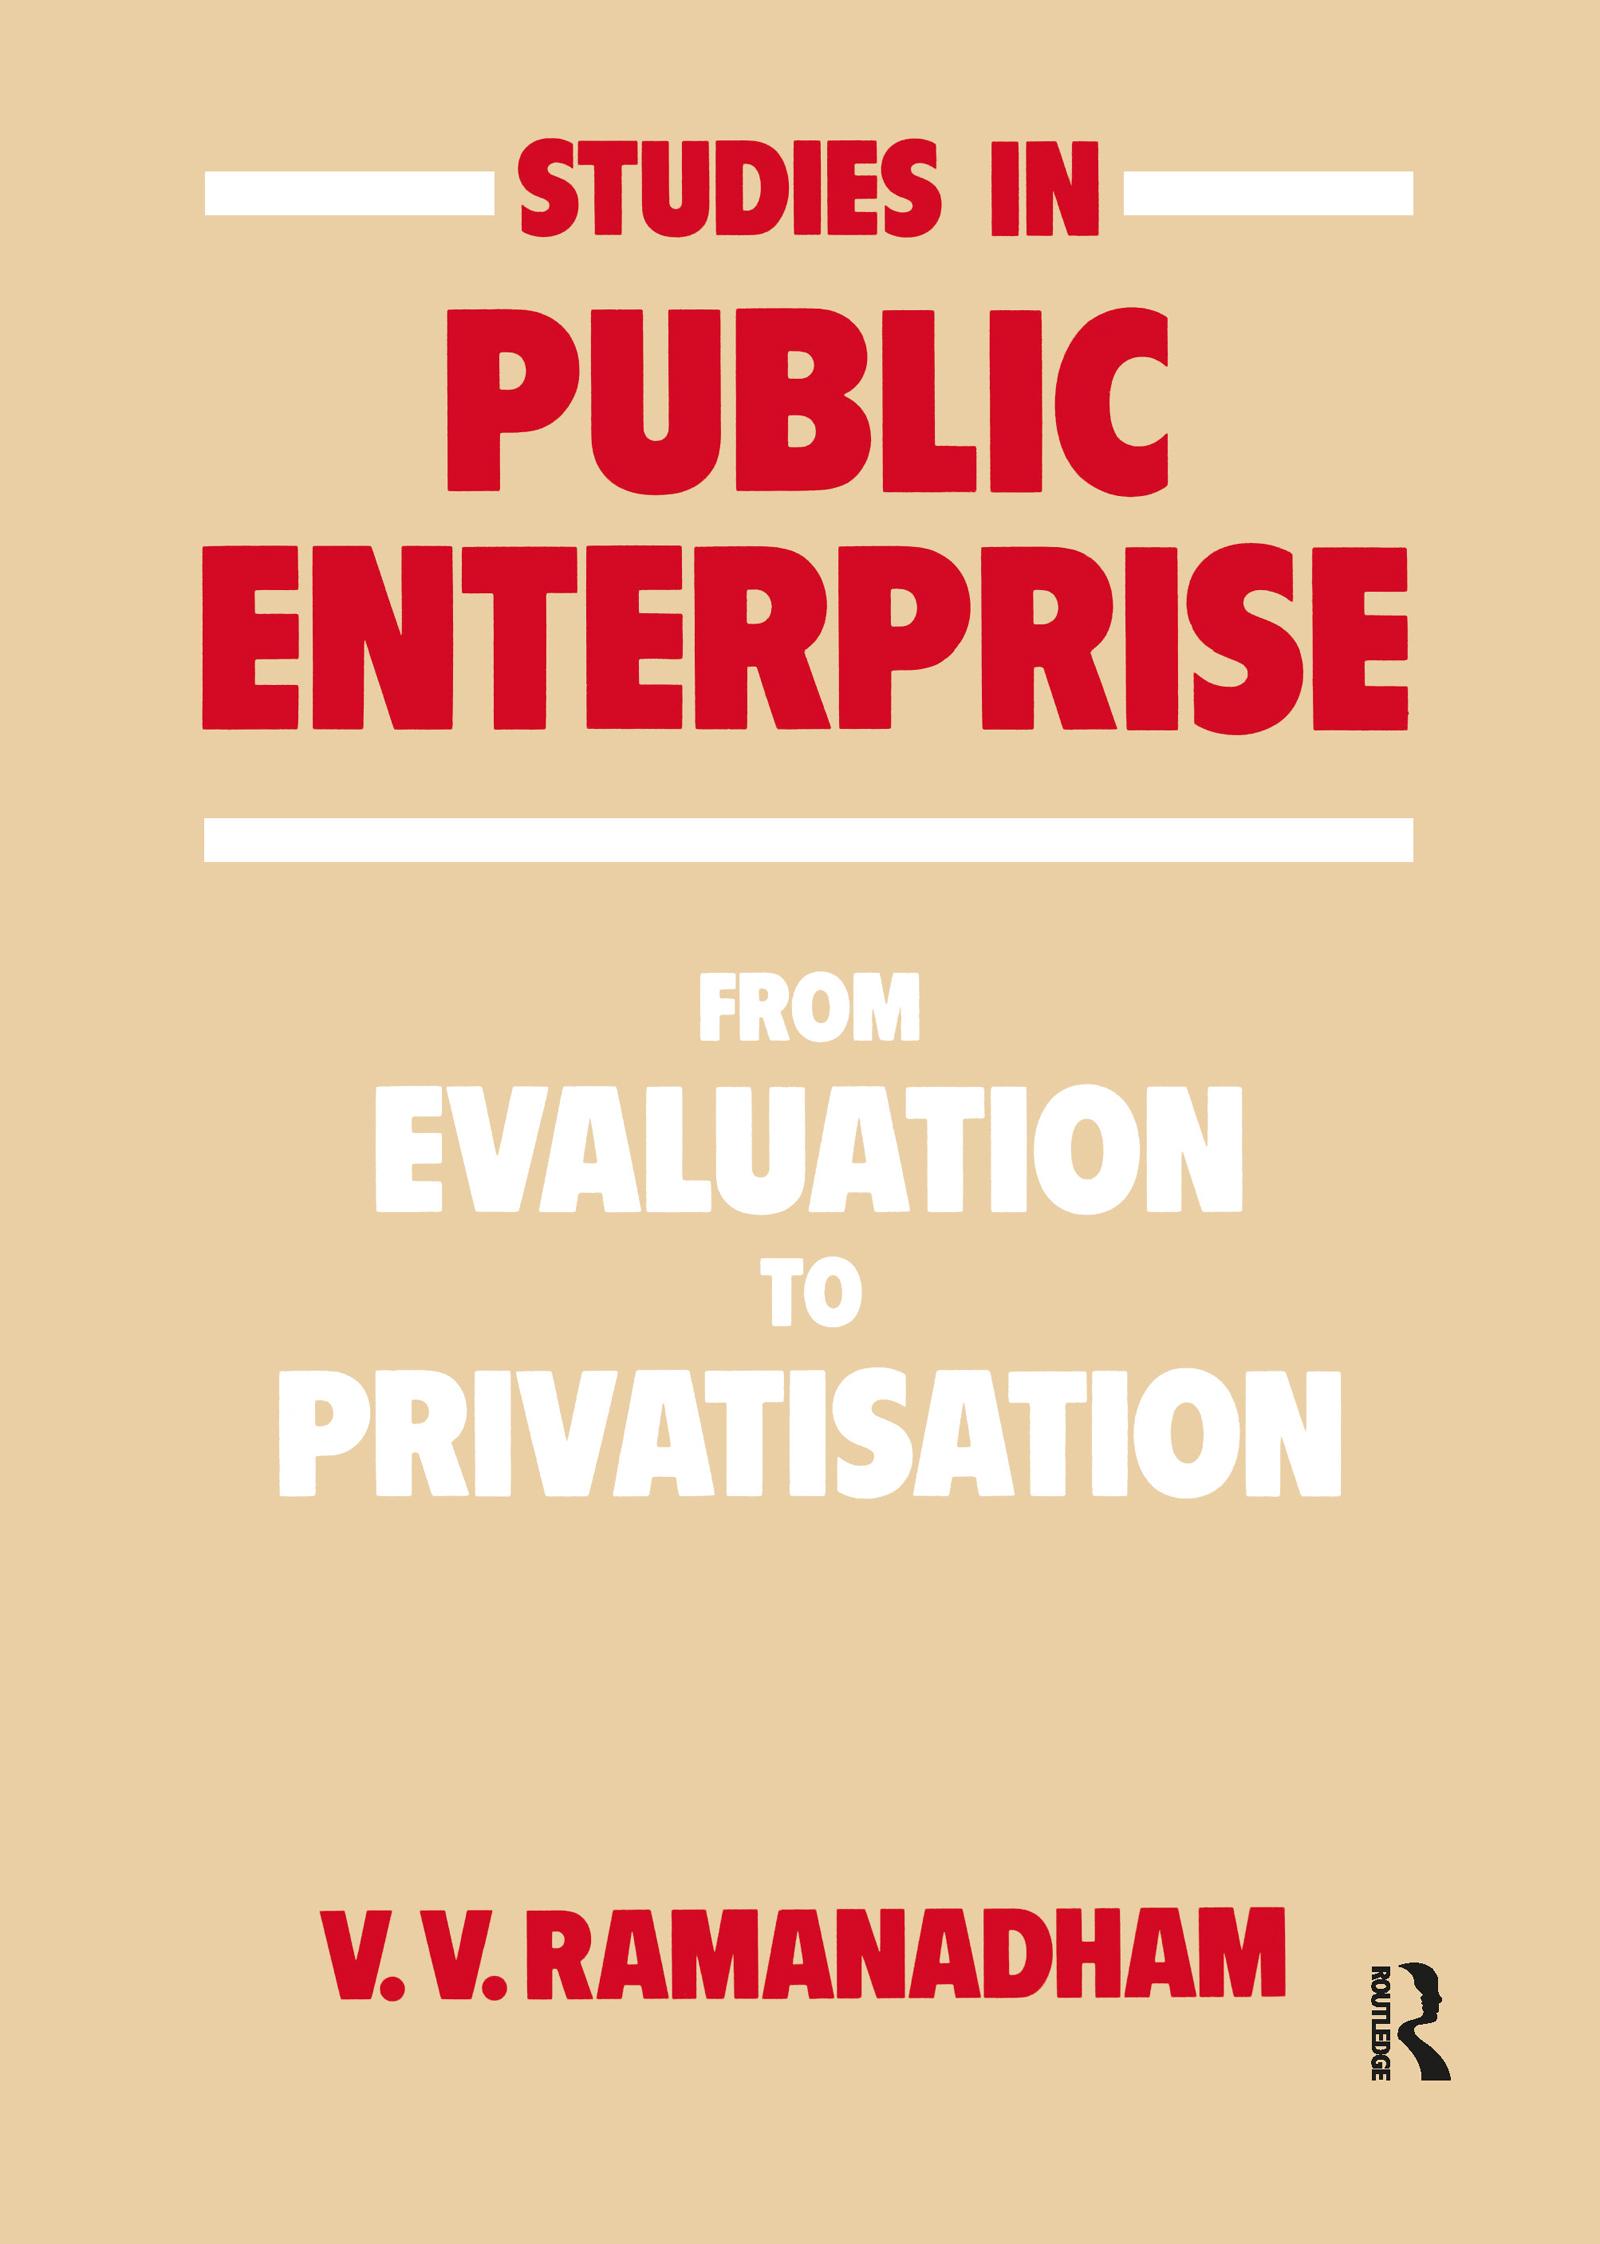 Studies in Public Enterprise